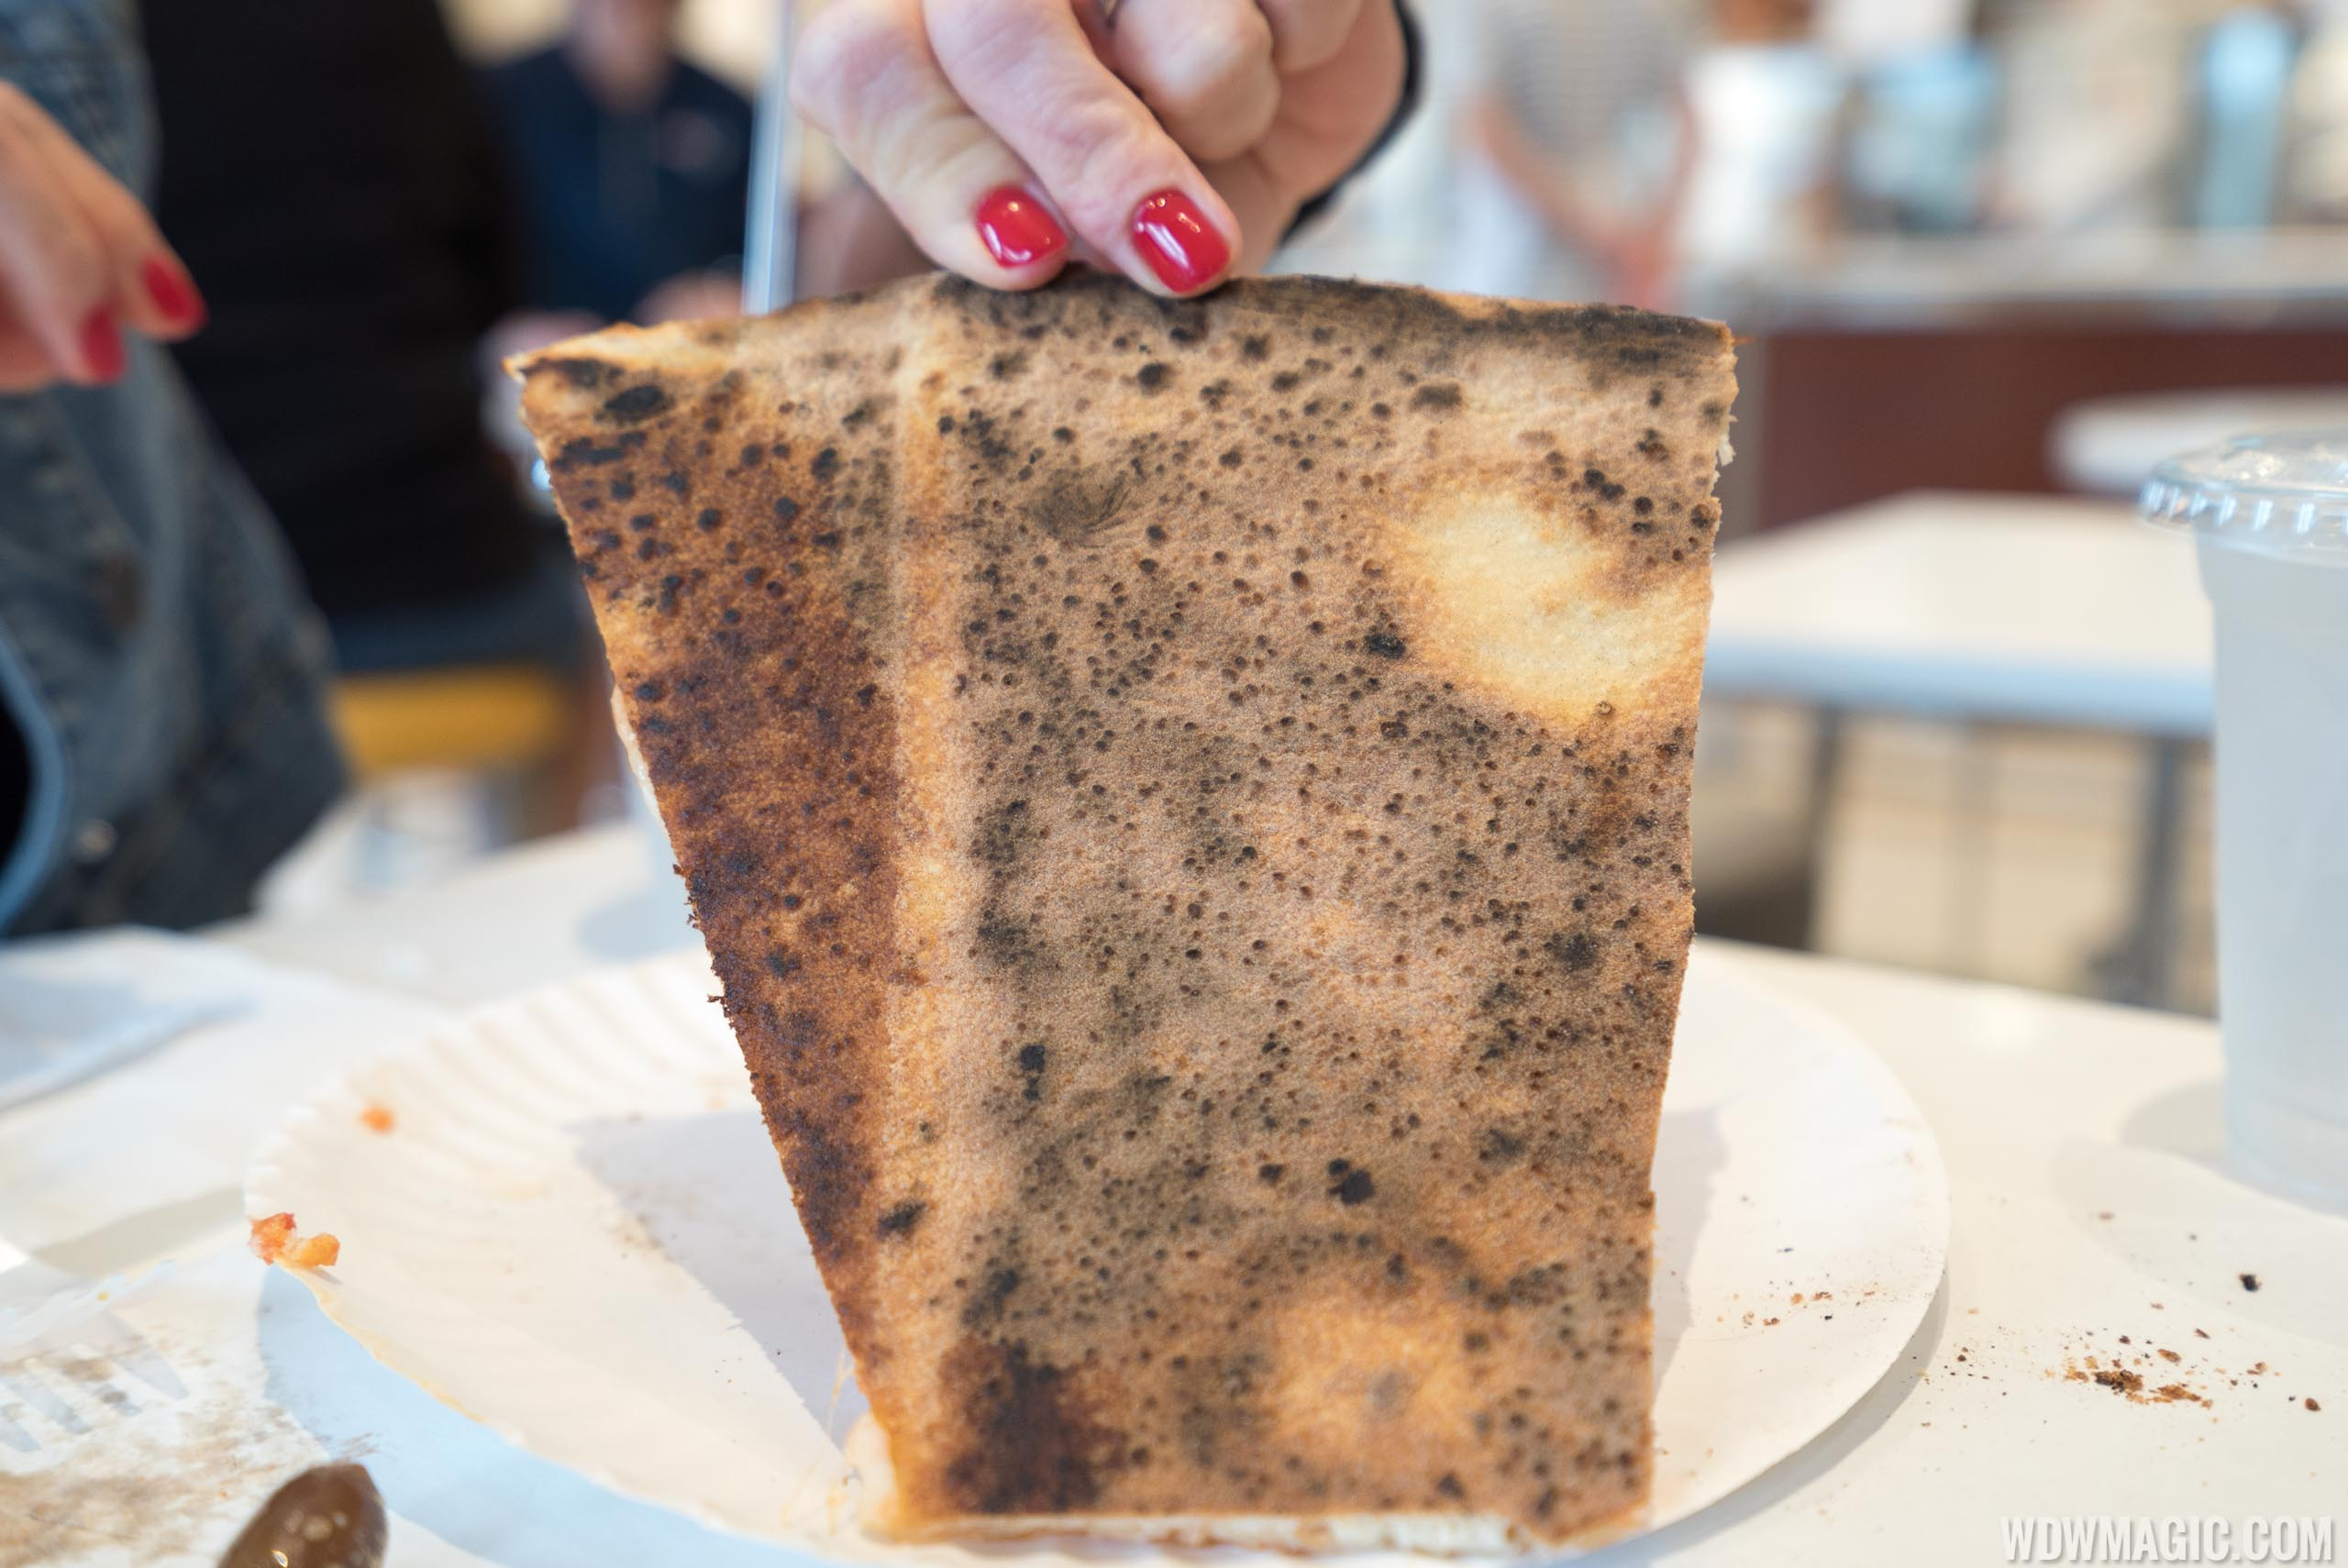 Pizza Ponte - Underside of pizza crust